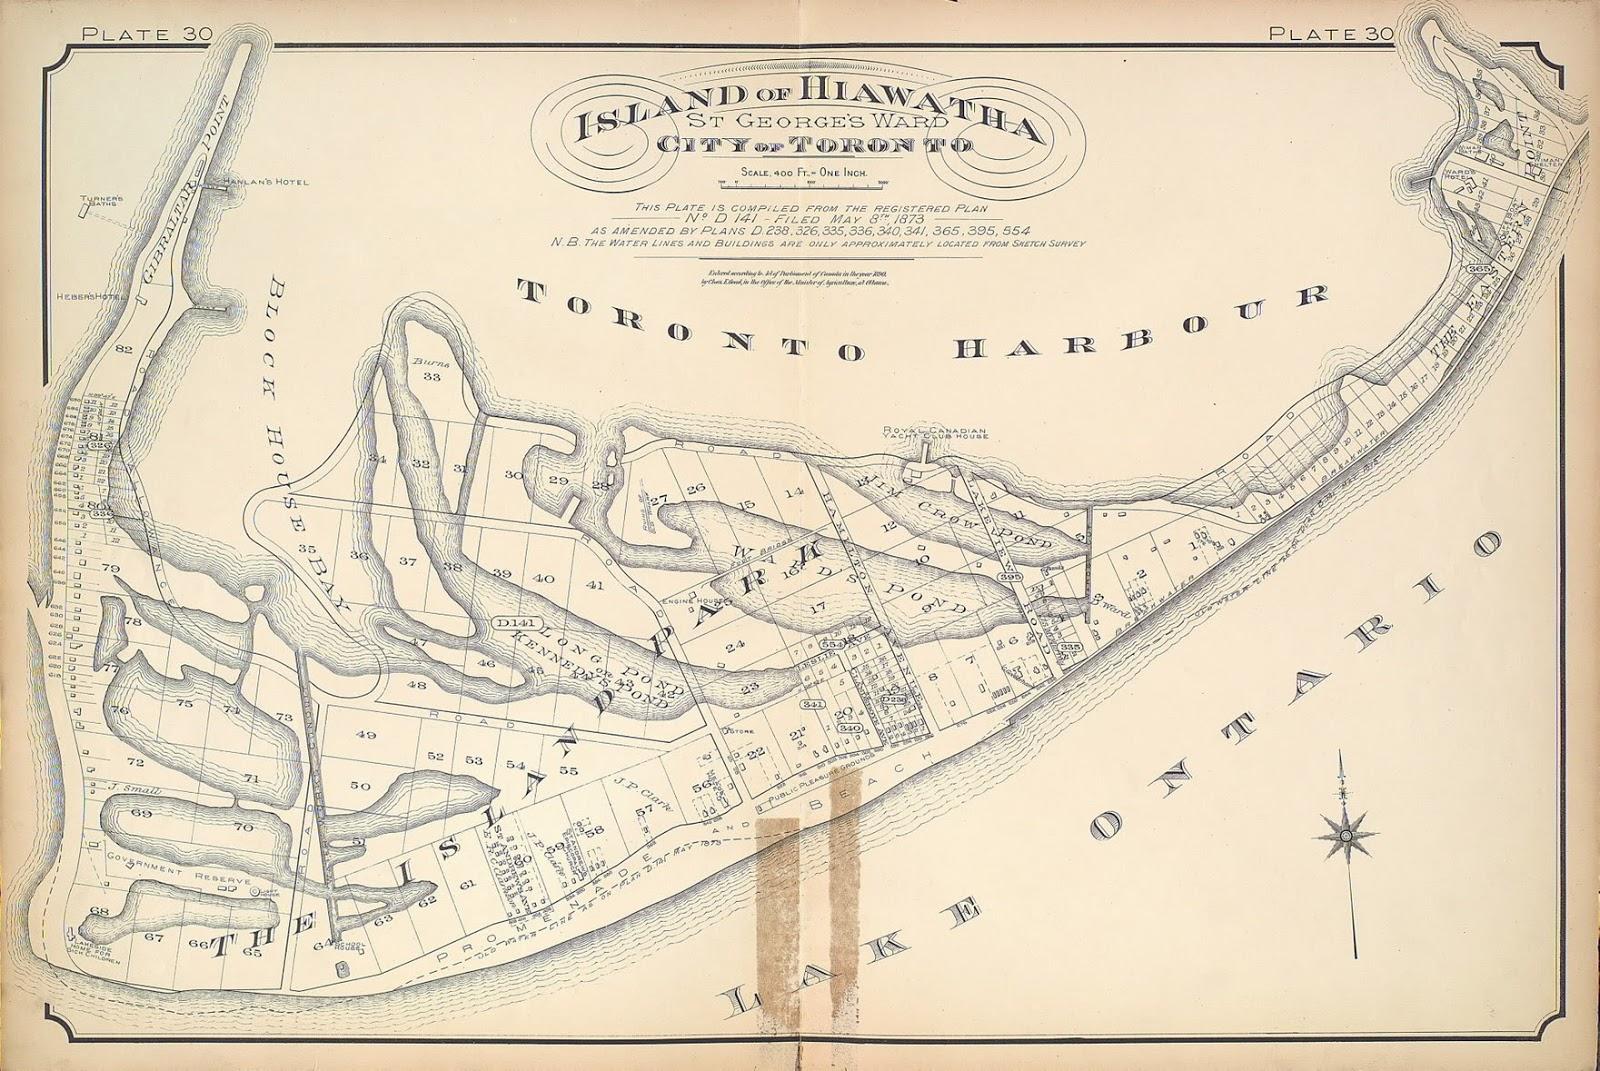 Toronto Island, Plate 30, 1893 Goad Atlas of Toronto